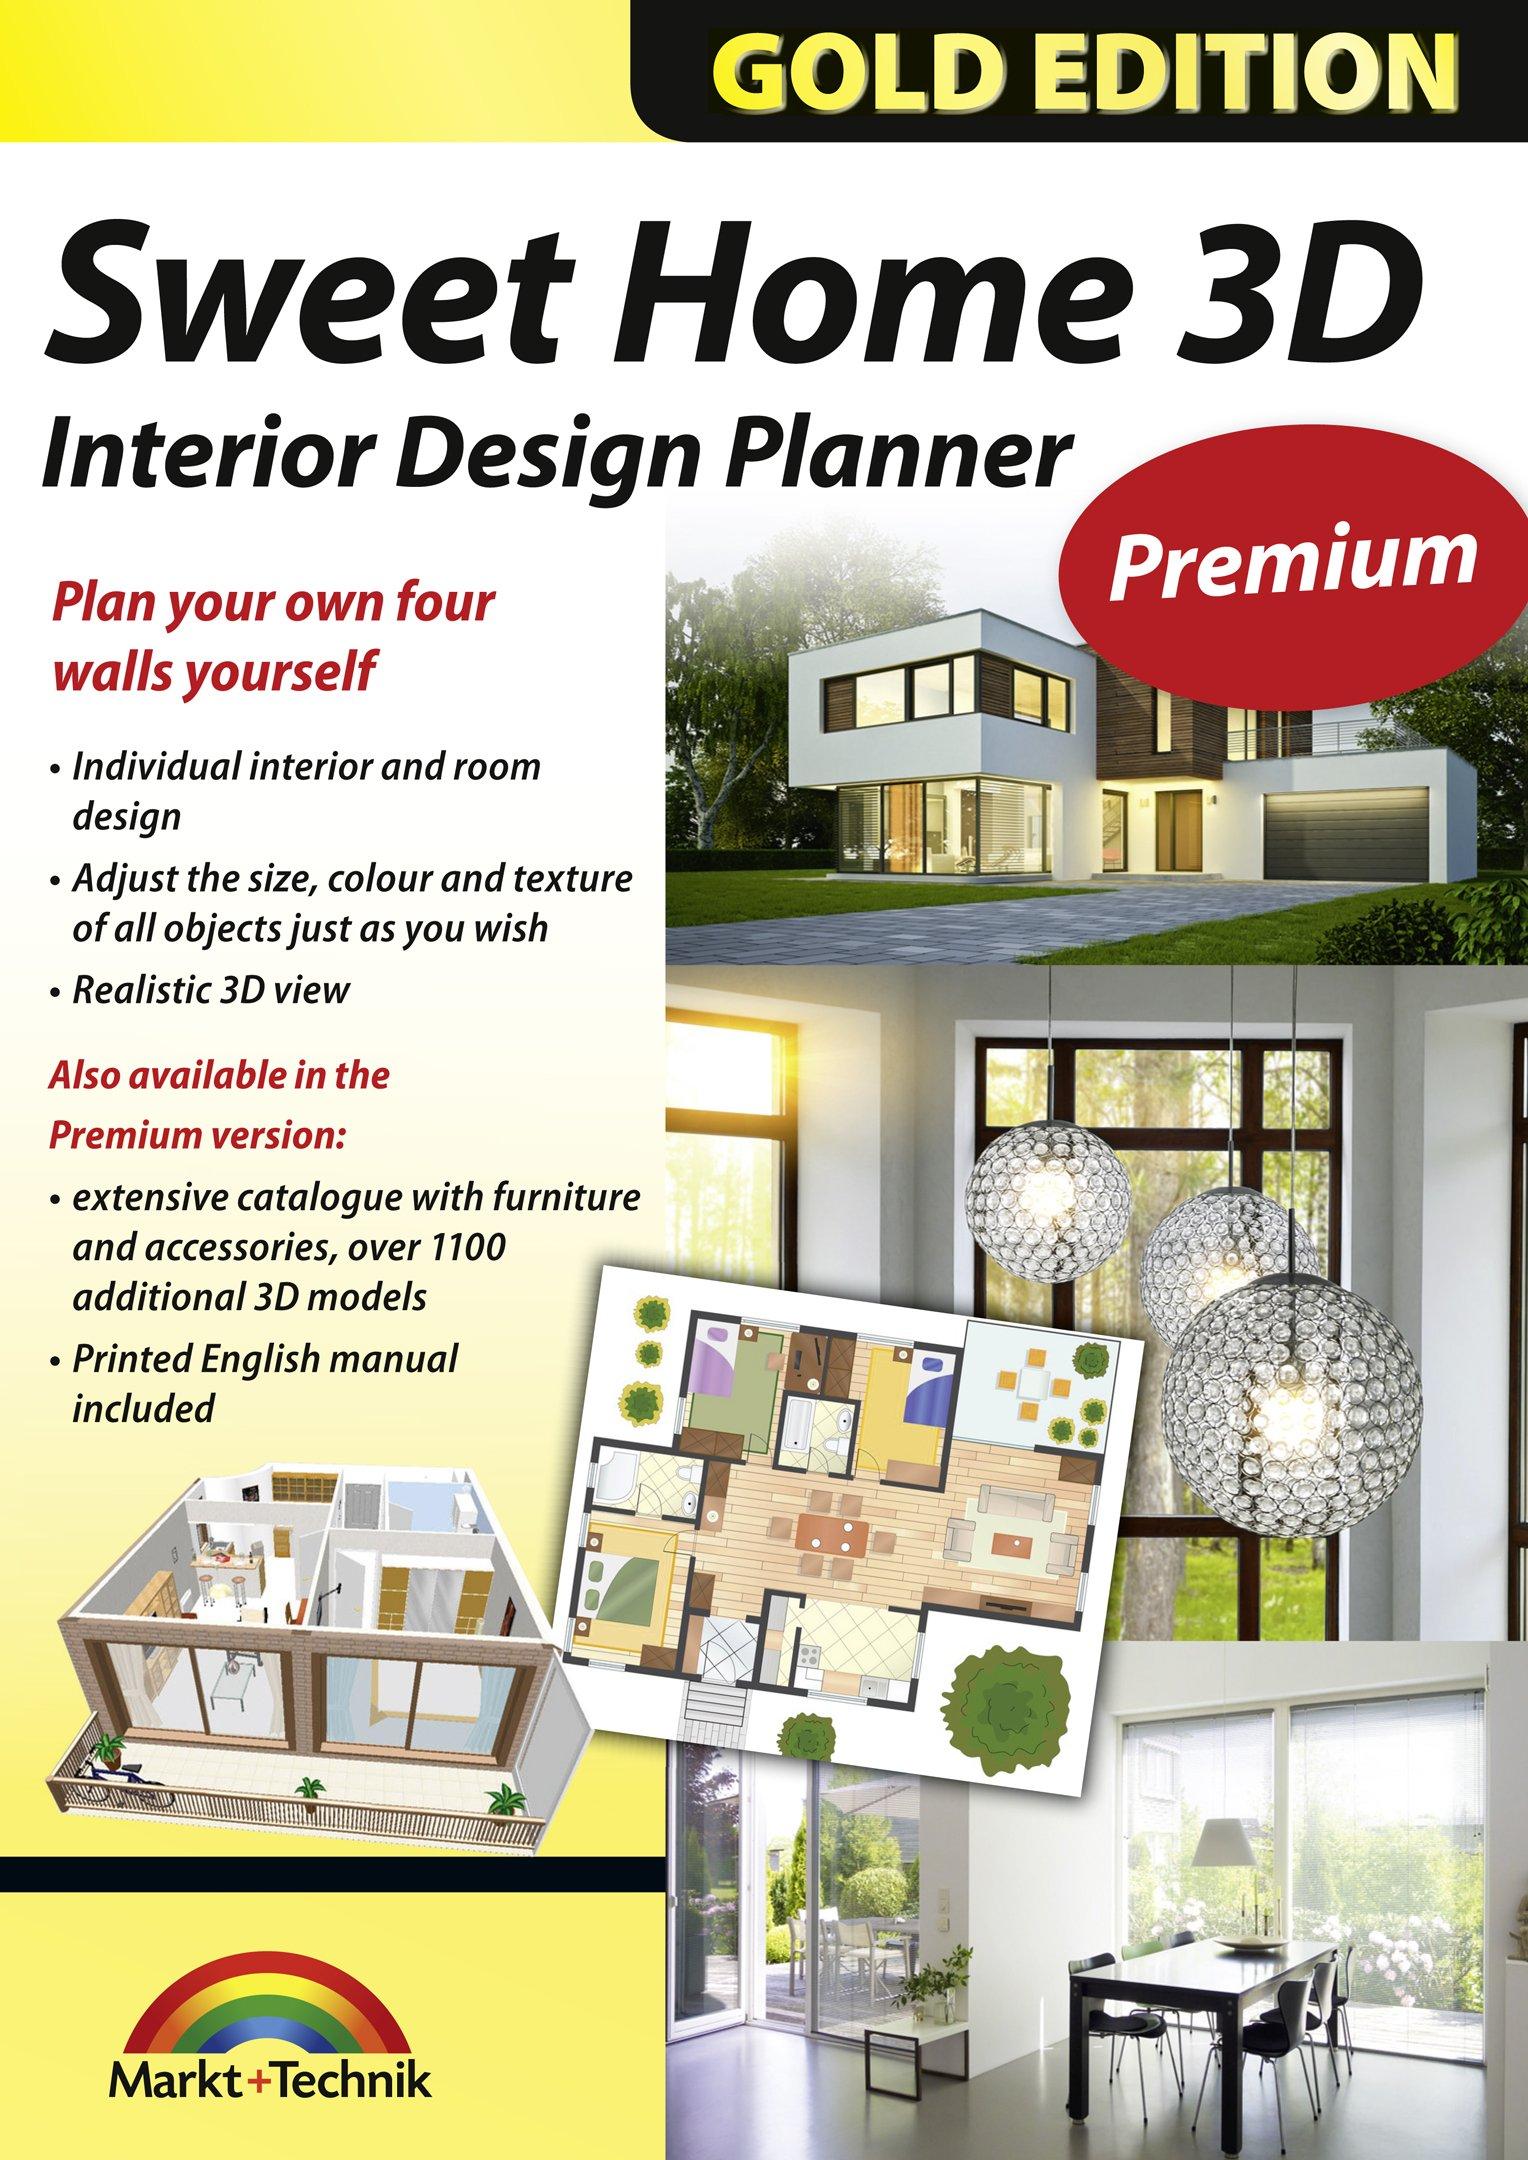 Sweet Home 3D Premium Edition - Interior Design Planner ...